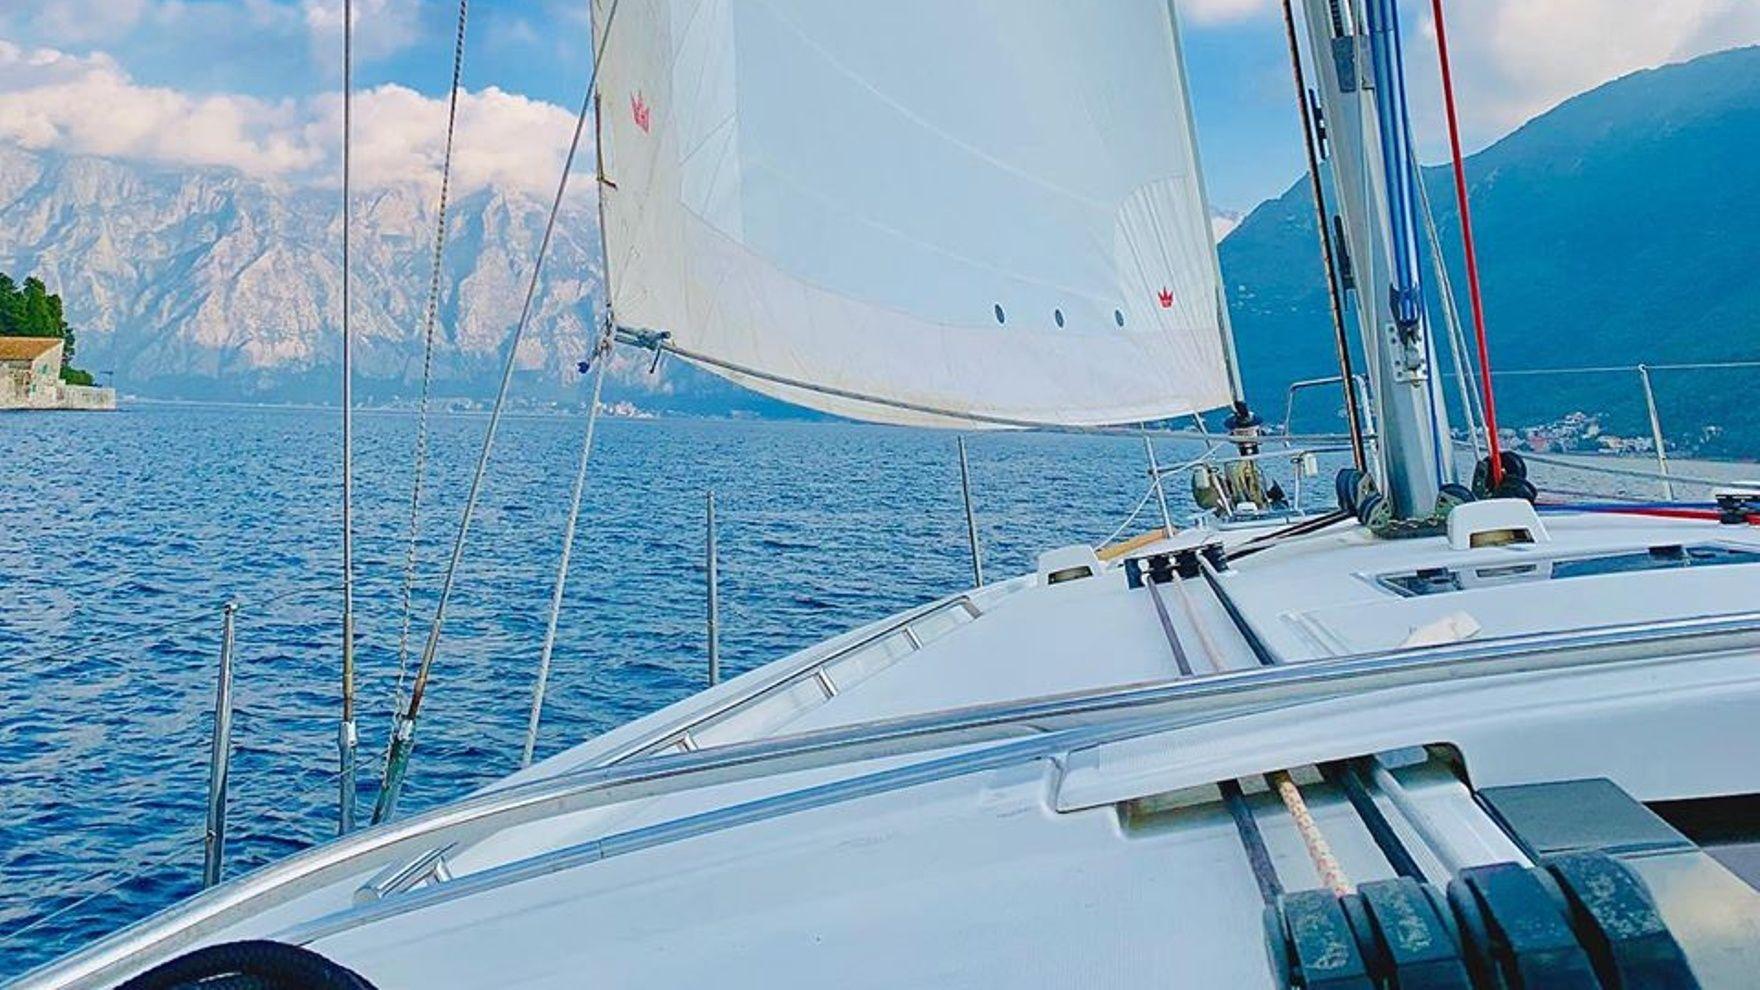 IYT Bareboat skipper in Sailing School SimpleSail